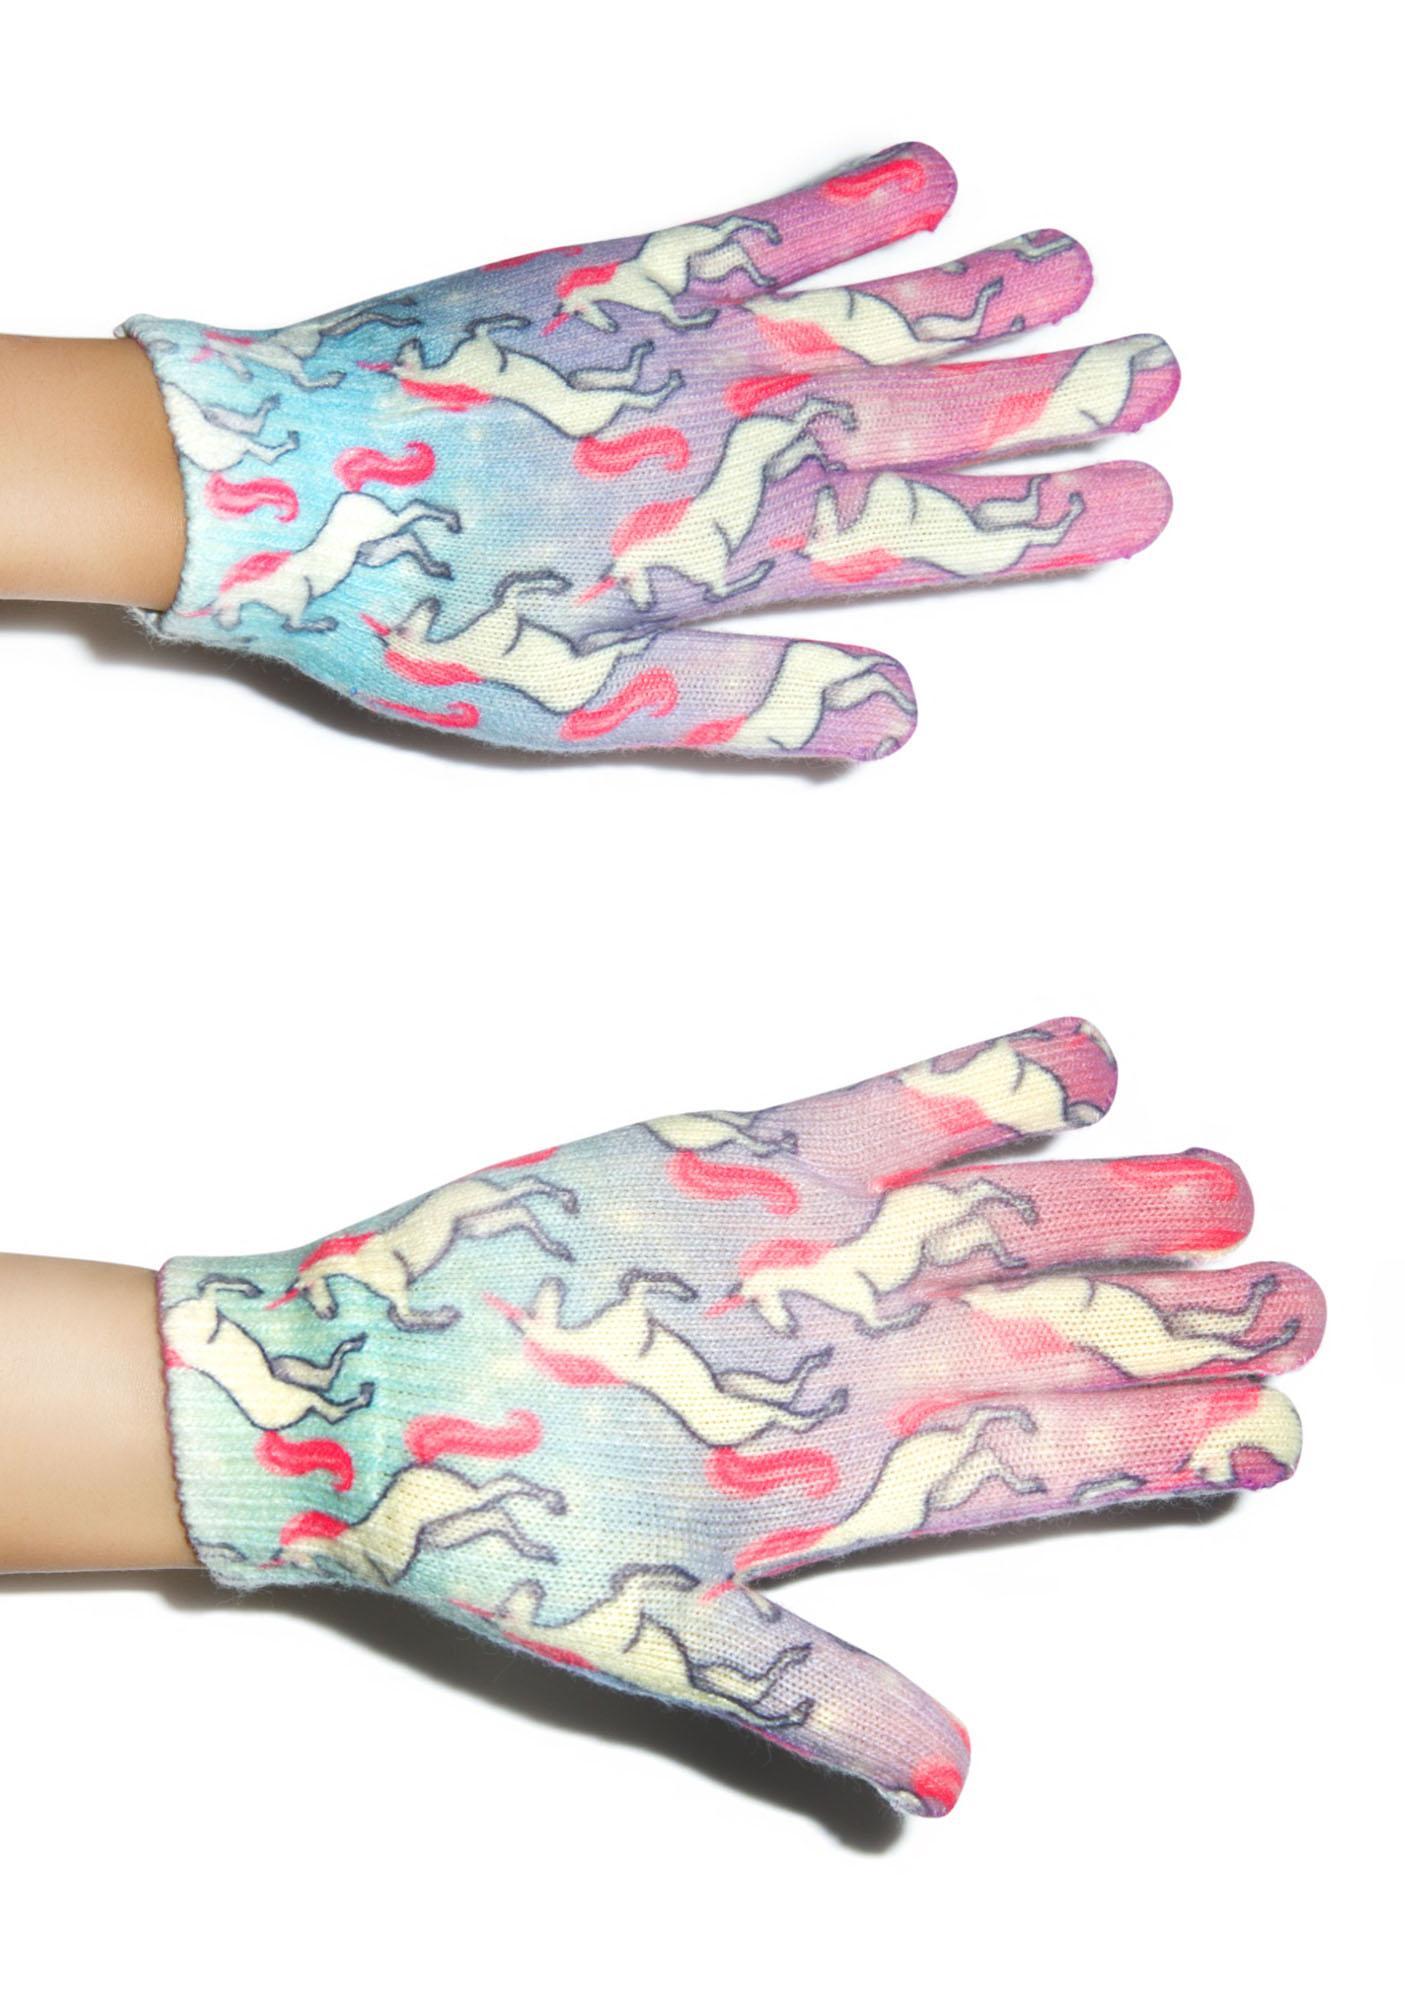 Unicorn Dreams Gloves